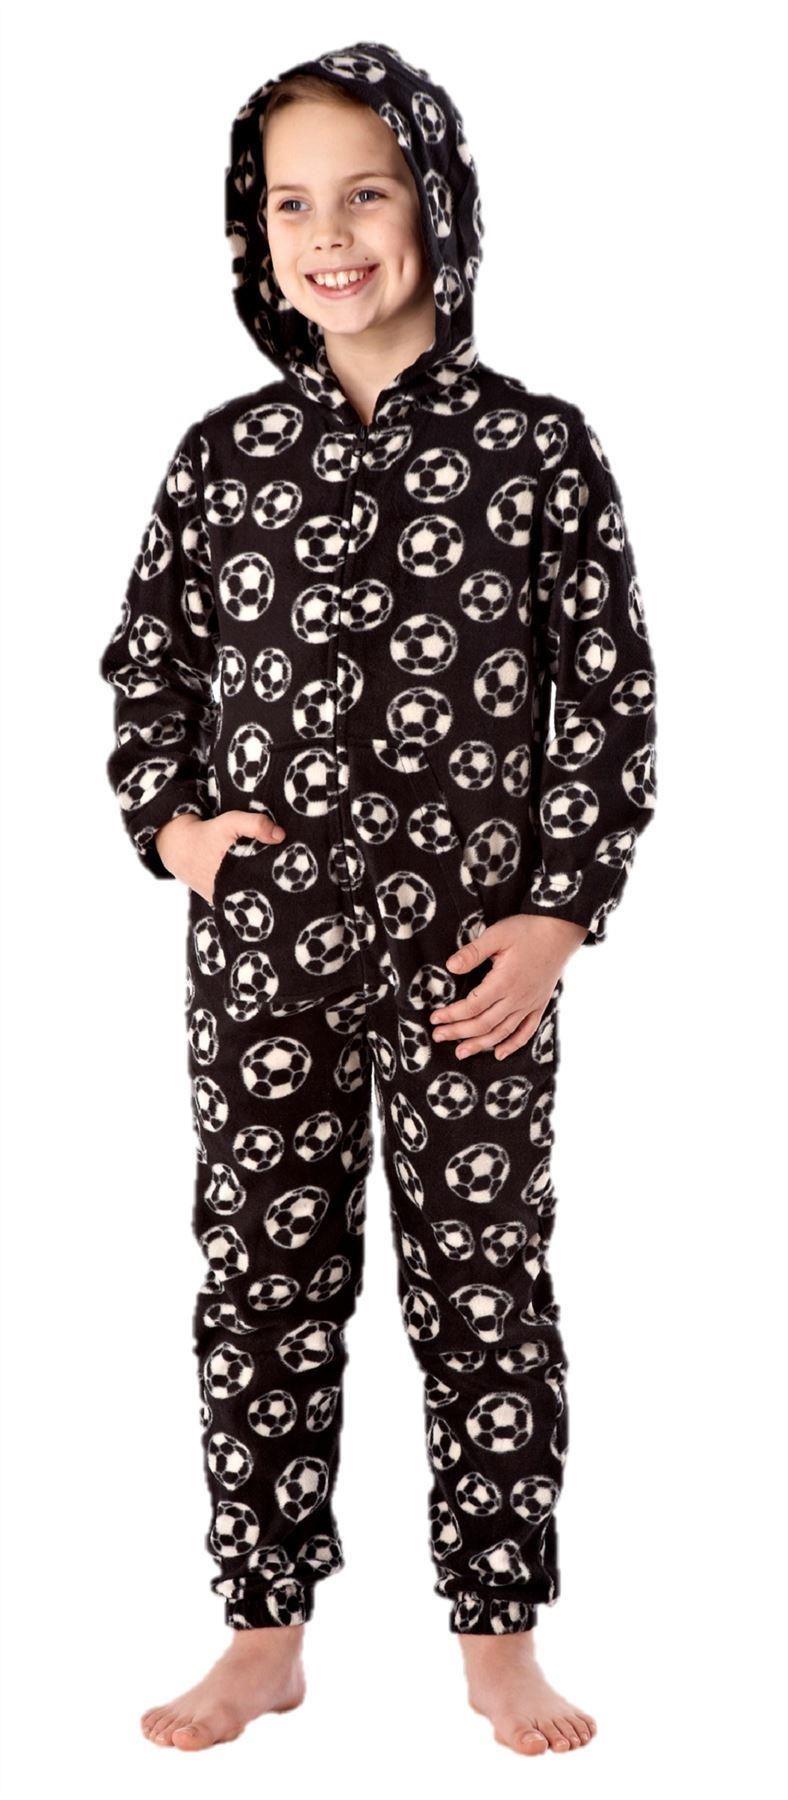 boys-all-in-one-sleepwear-pyjama-pajama-ones-one-piece-hoodie-FOOTBALL thumbnail 3